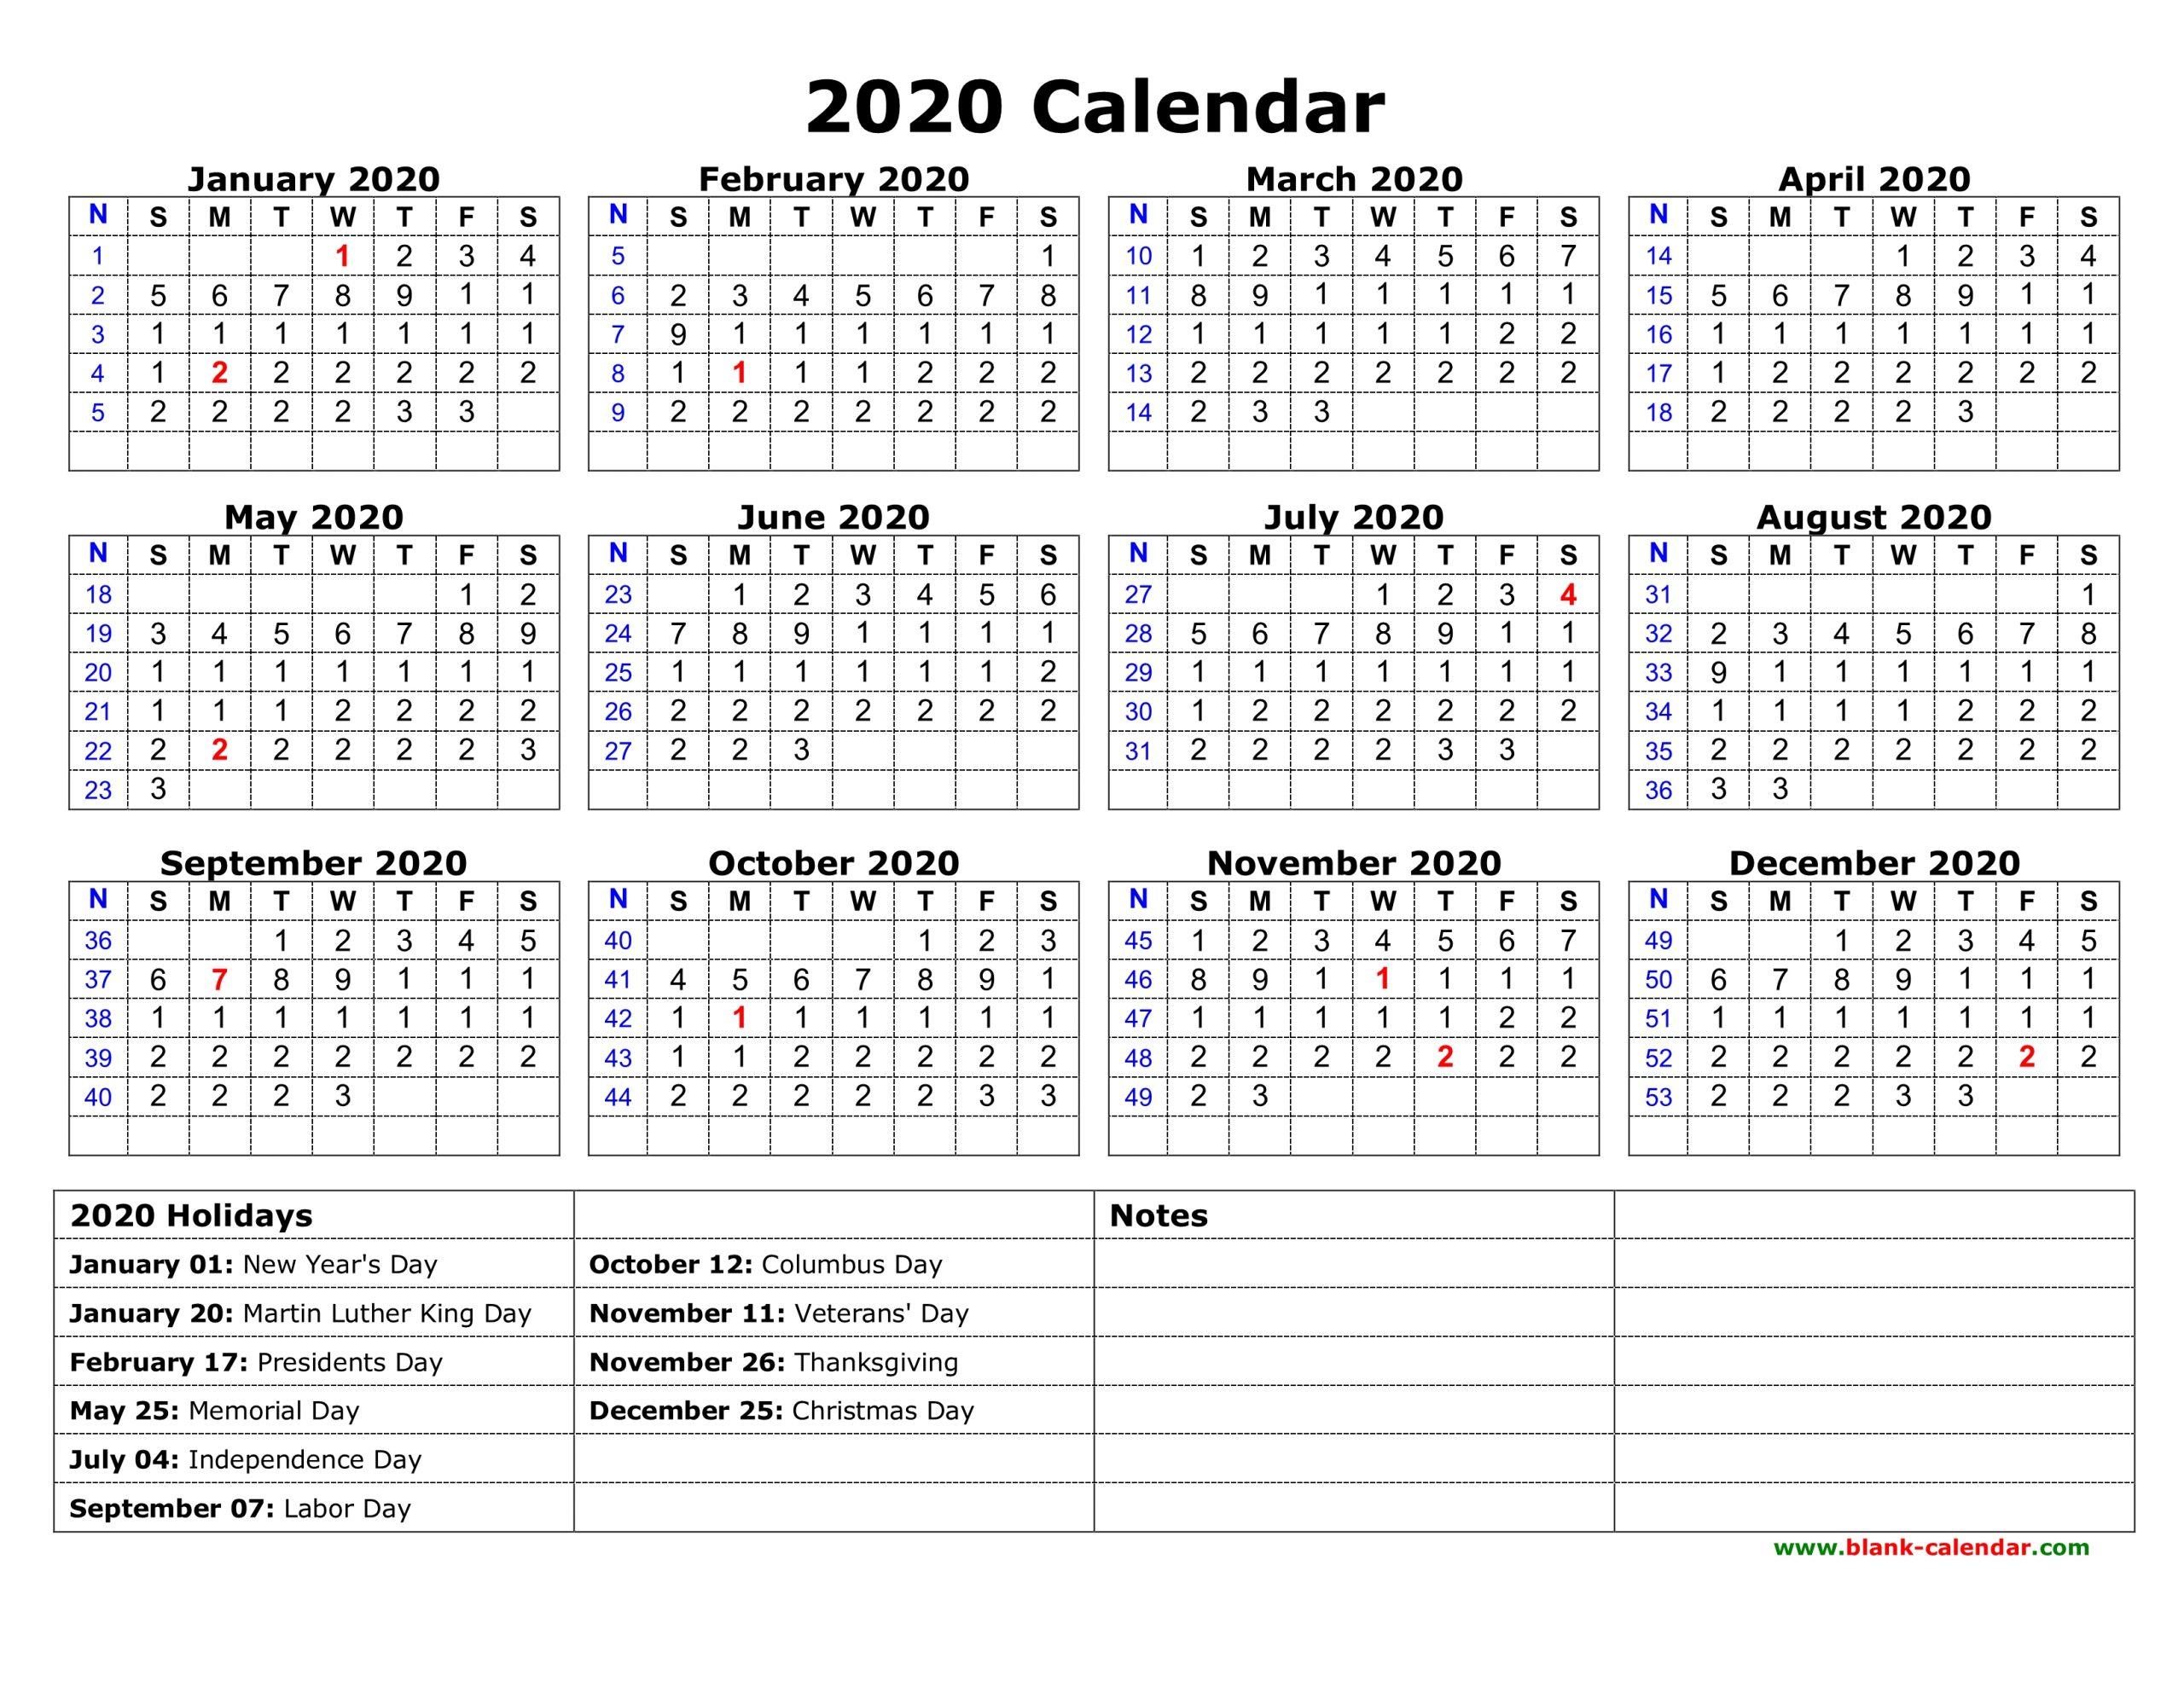 Calendar 2020 Printable With Holidays - Togo.wpart.co